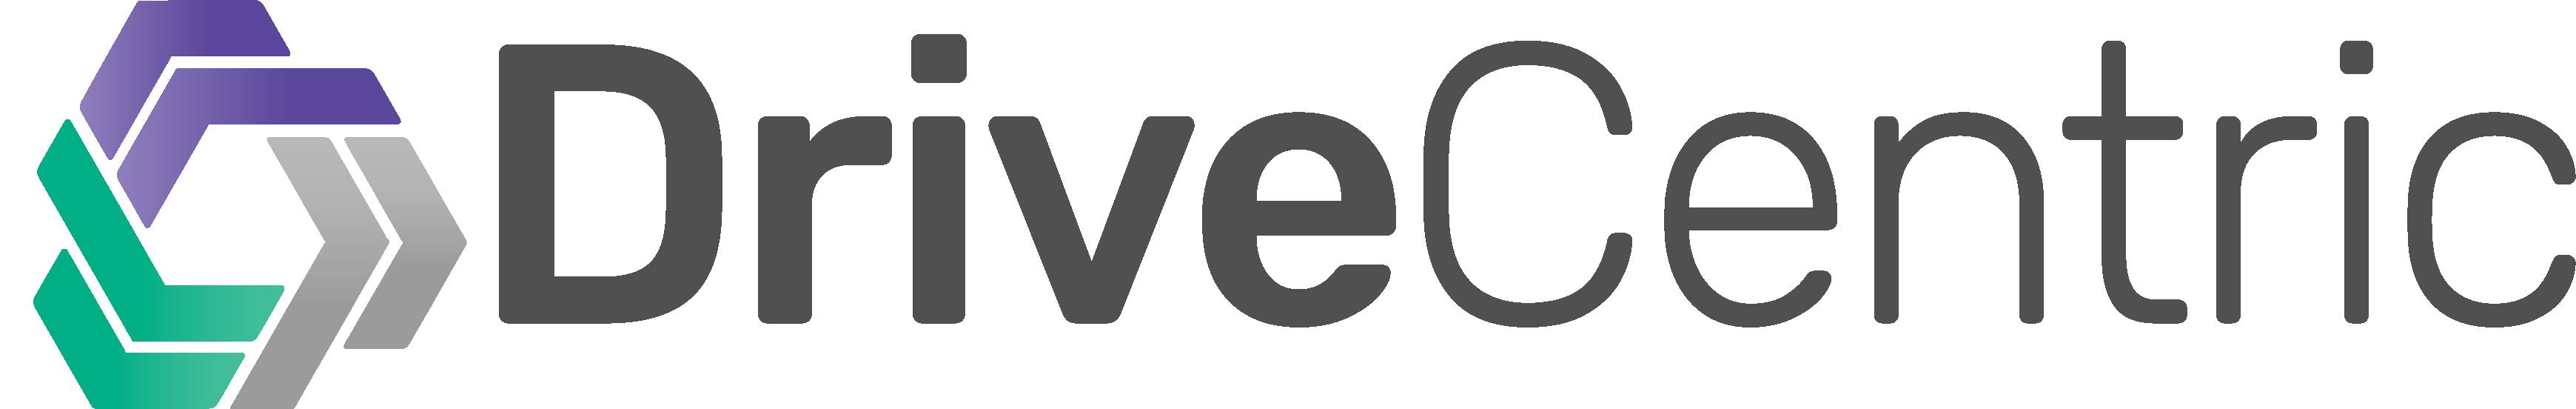 DriveCentric logo